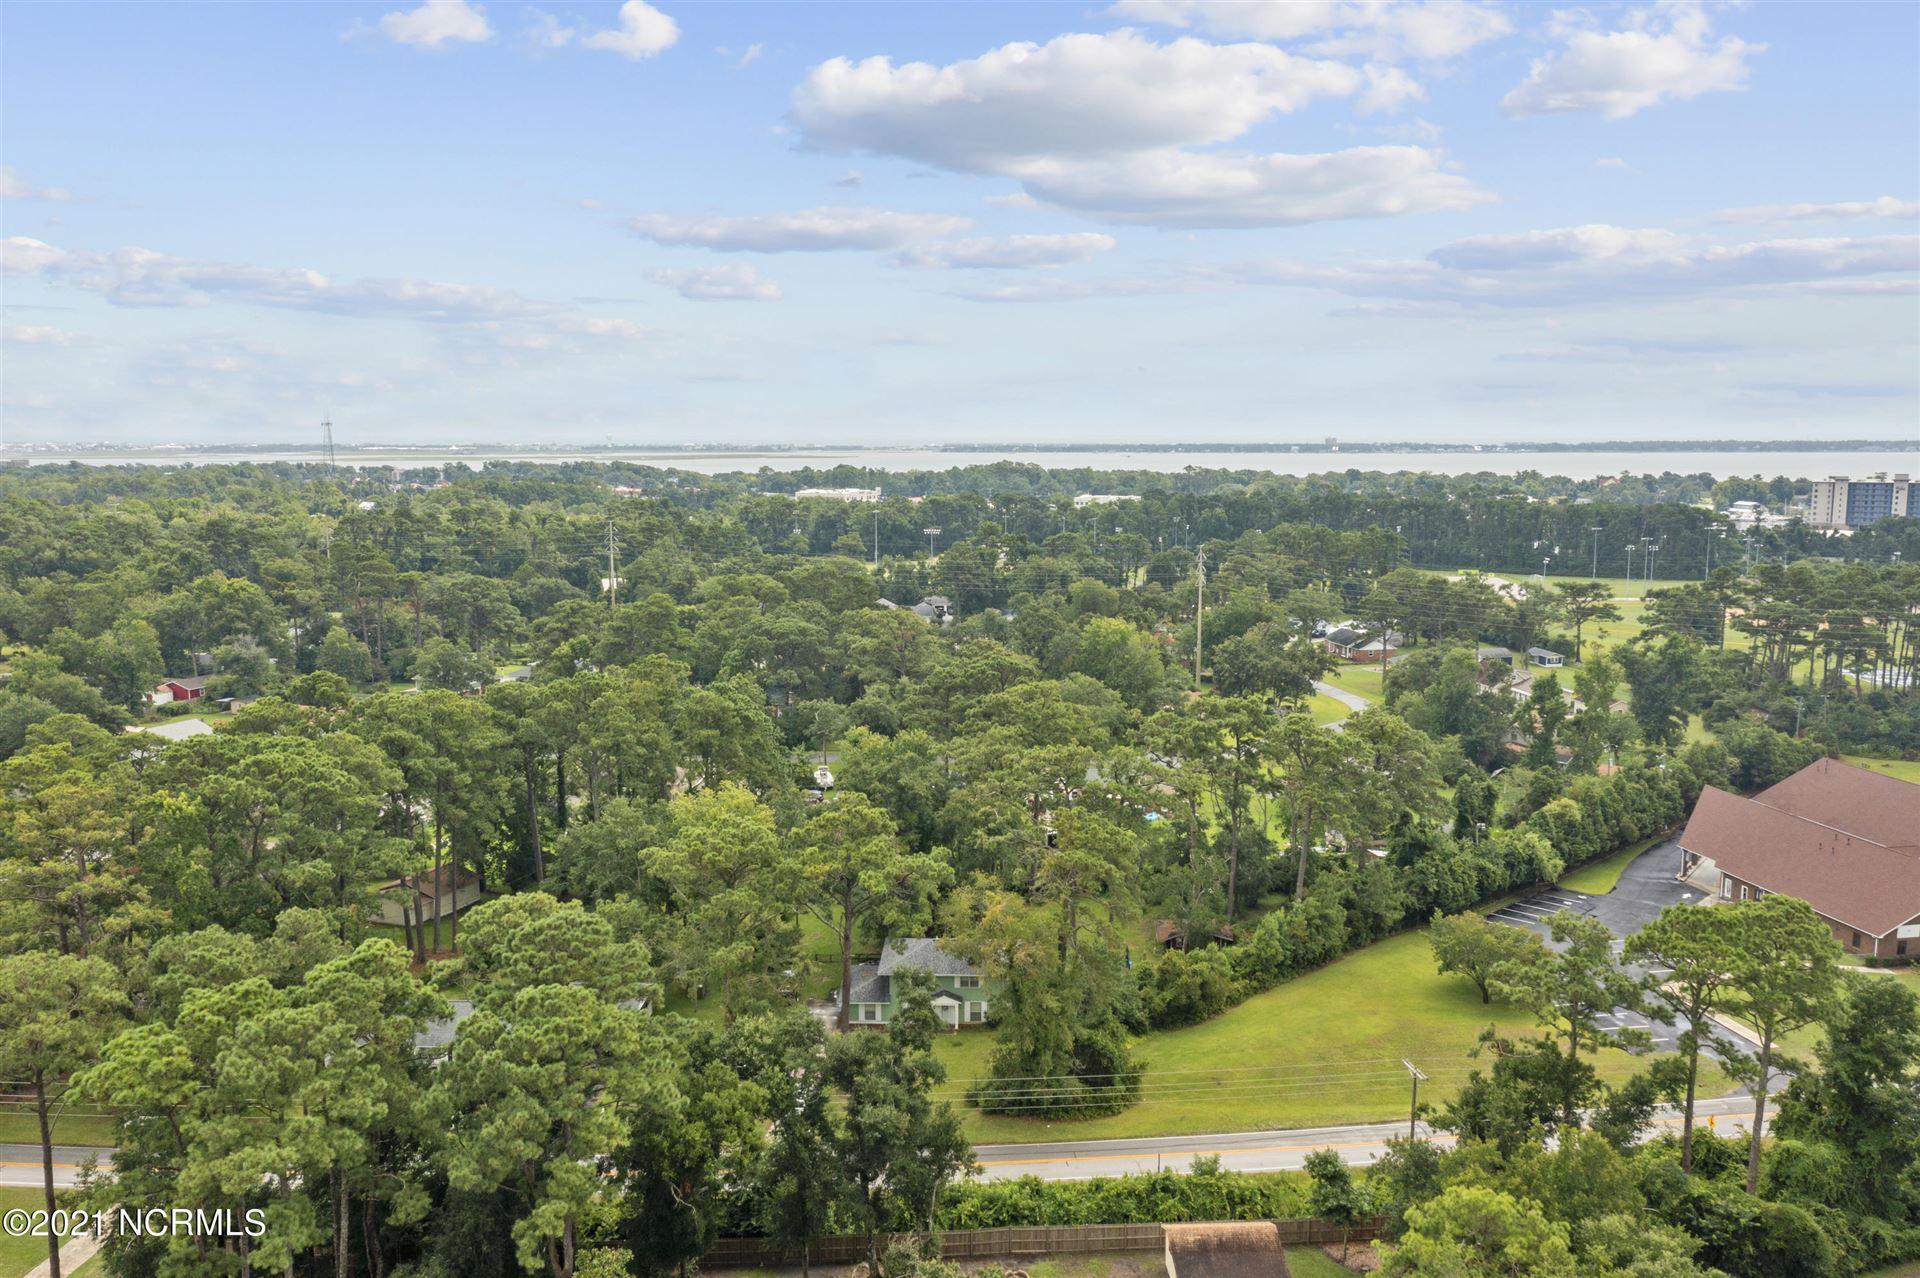 Photo of 4305 Country Club Road, Morehead City, NC 28557 (MLS # 100285211)